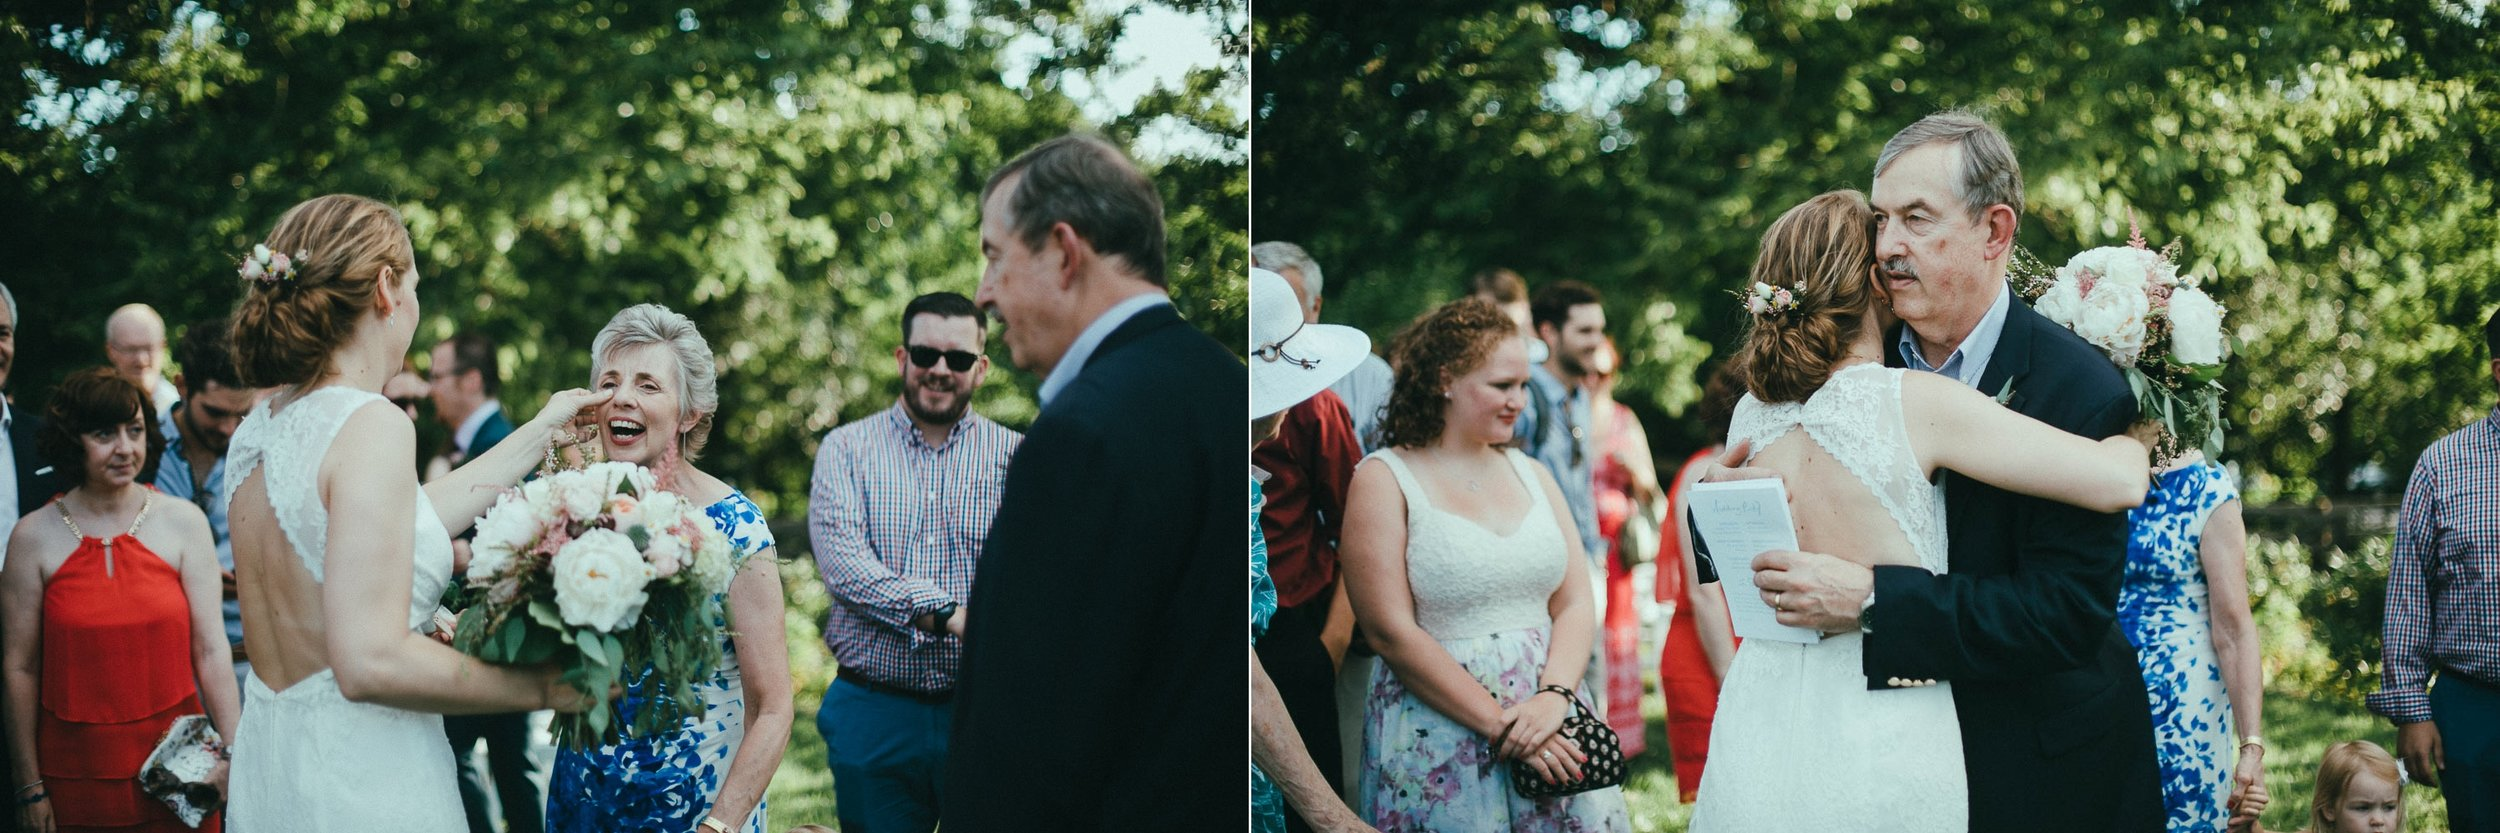 washington-wedding-photographer (40).jpg